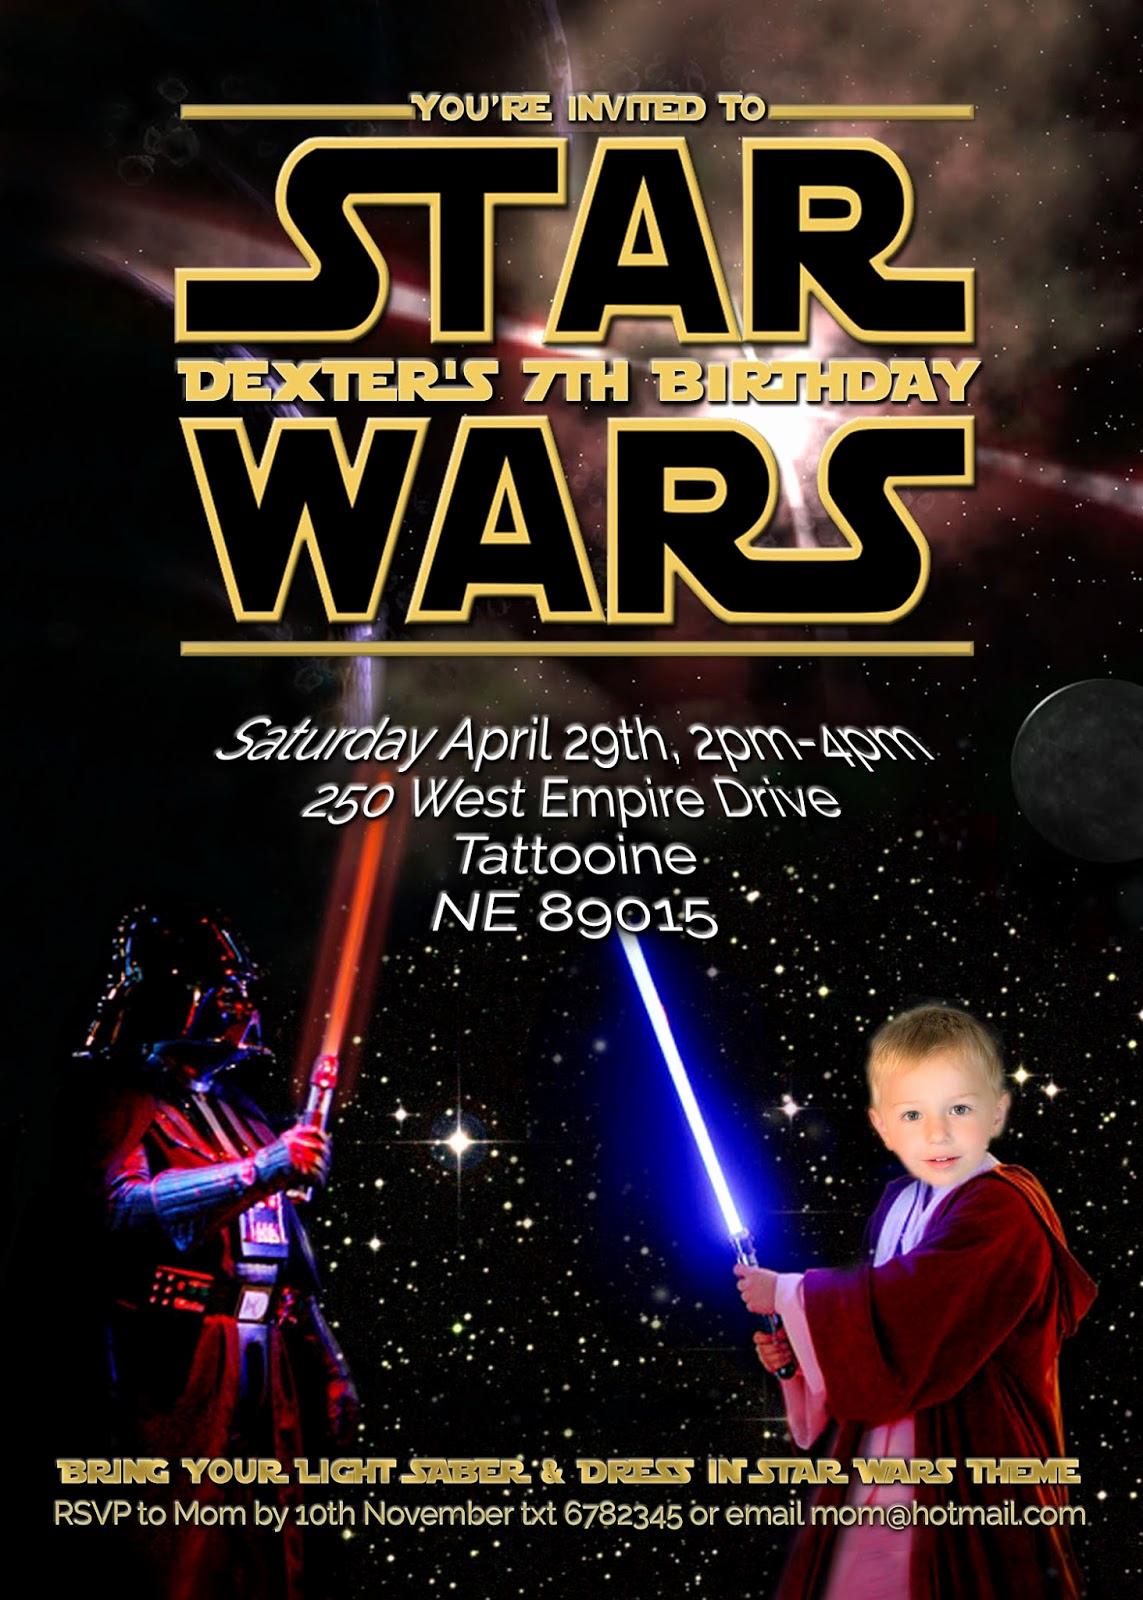 Star Wars Birthday Invitations Unique Free Kids Party Invitations Star Wars Party Invitation